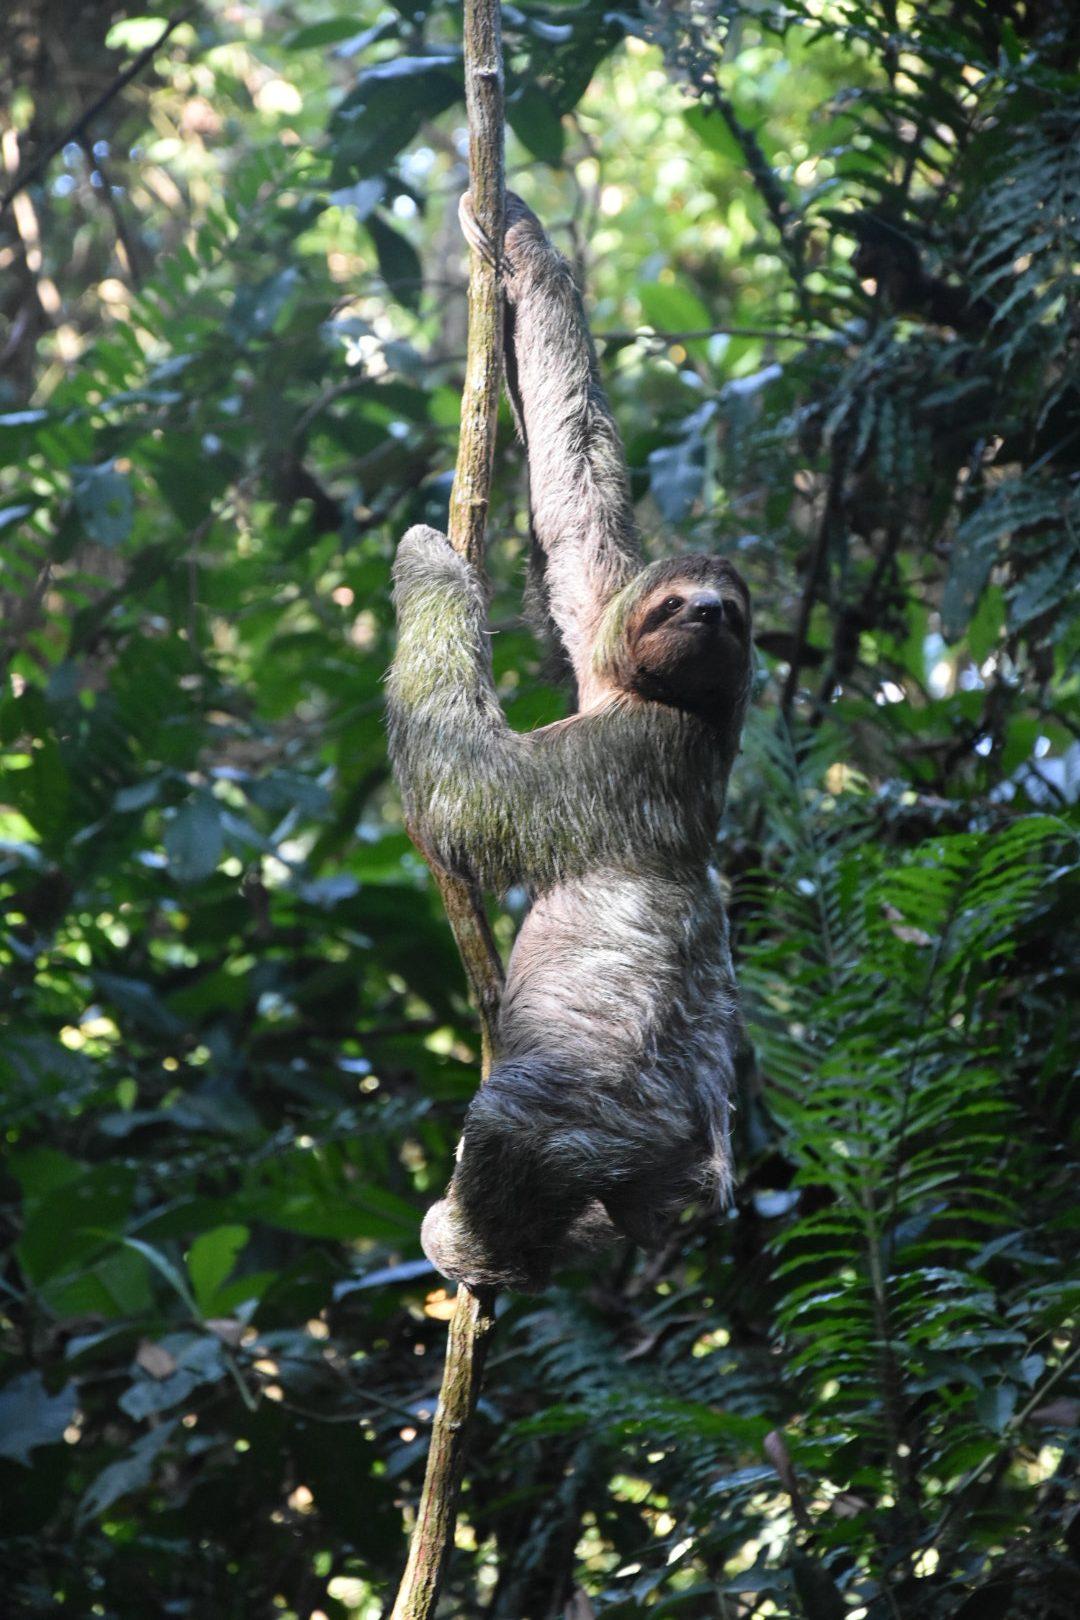 COSTA RICA: Le parc Manuel Antonio et ses environs